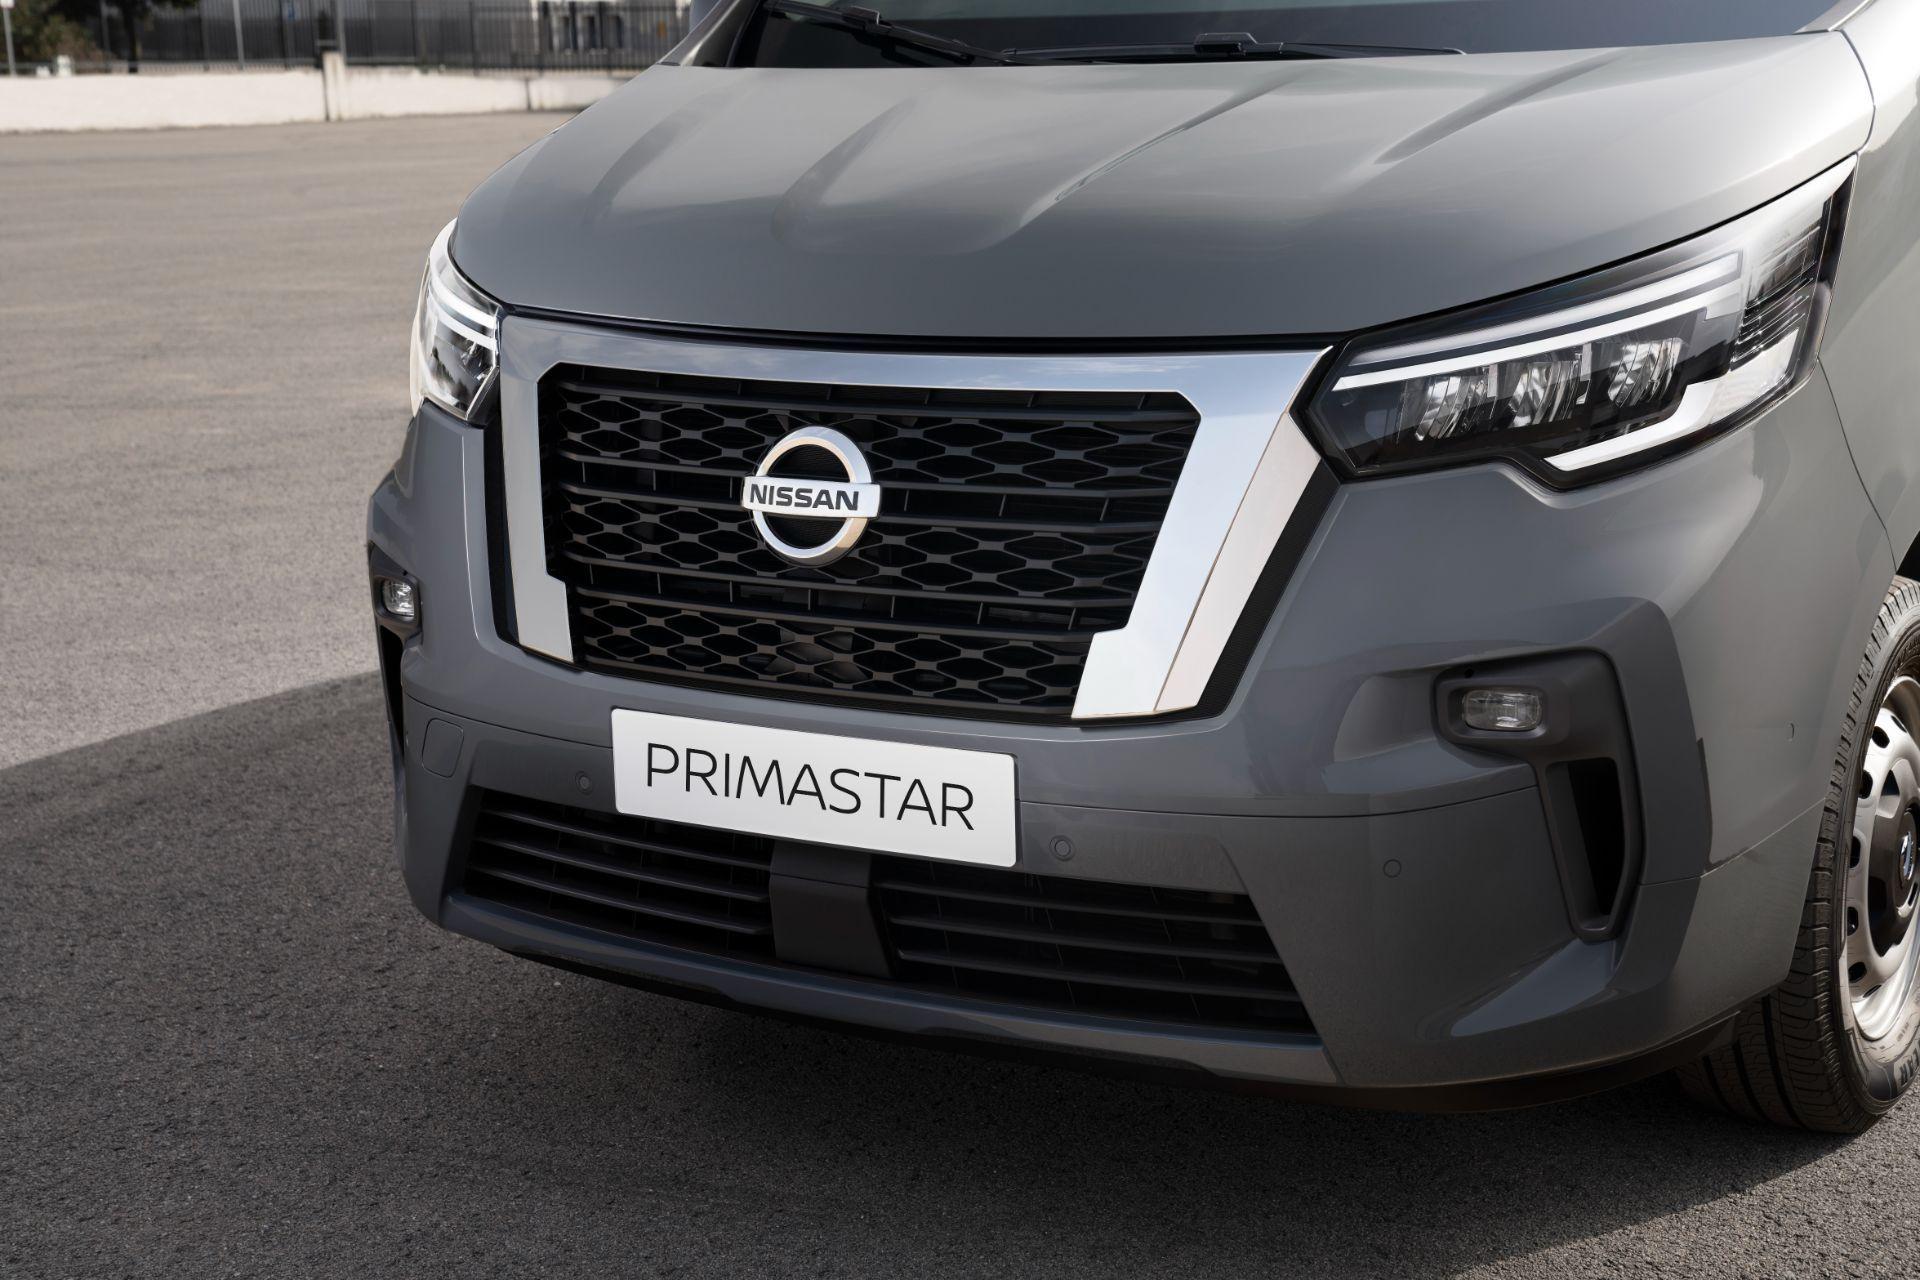 2022-Nissan-Primastar-Van-4-1